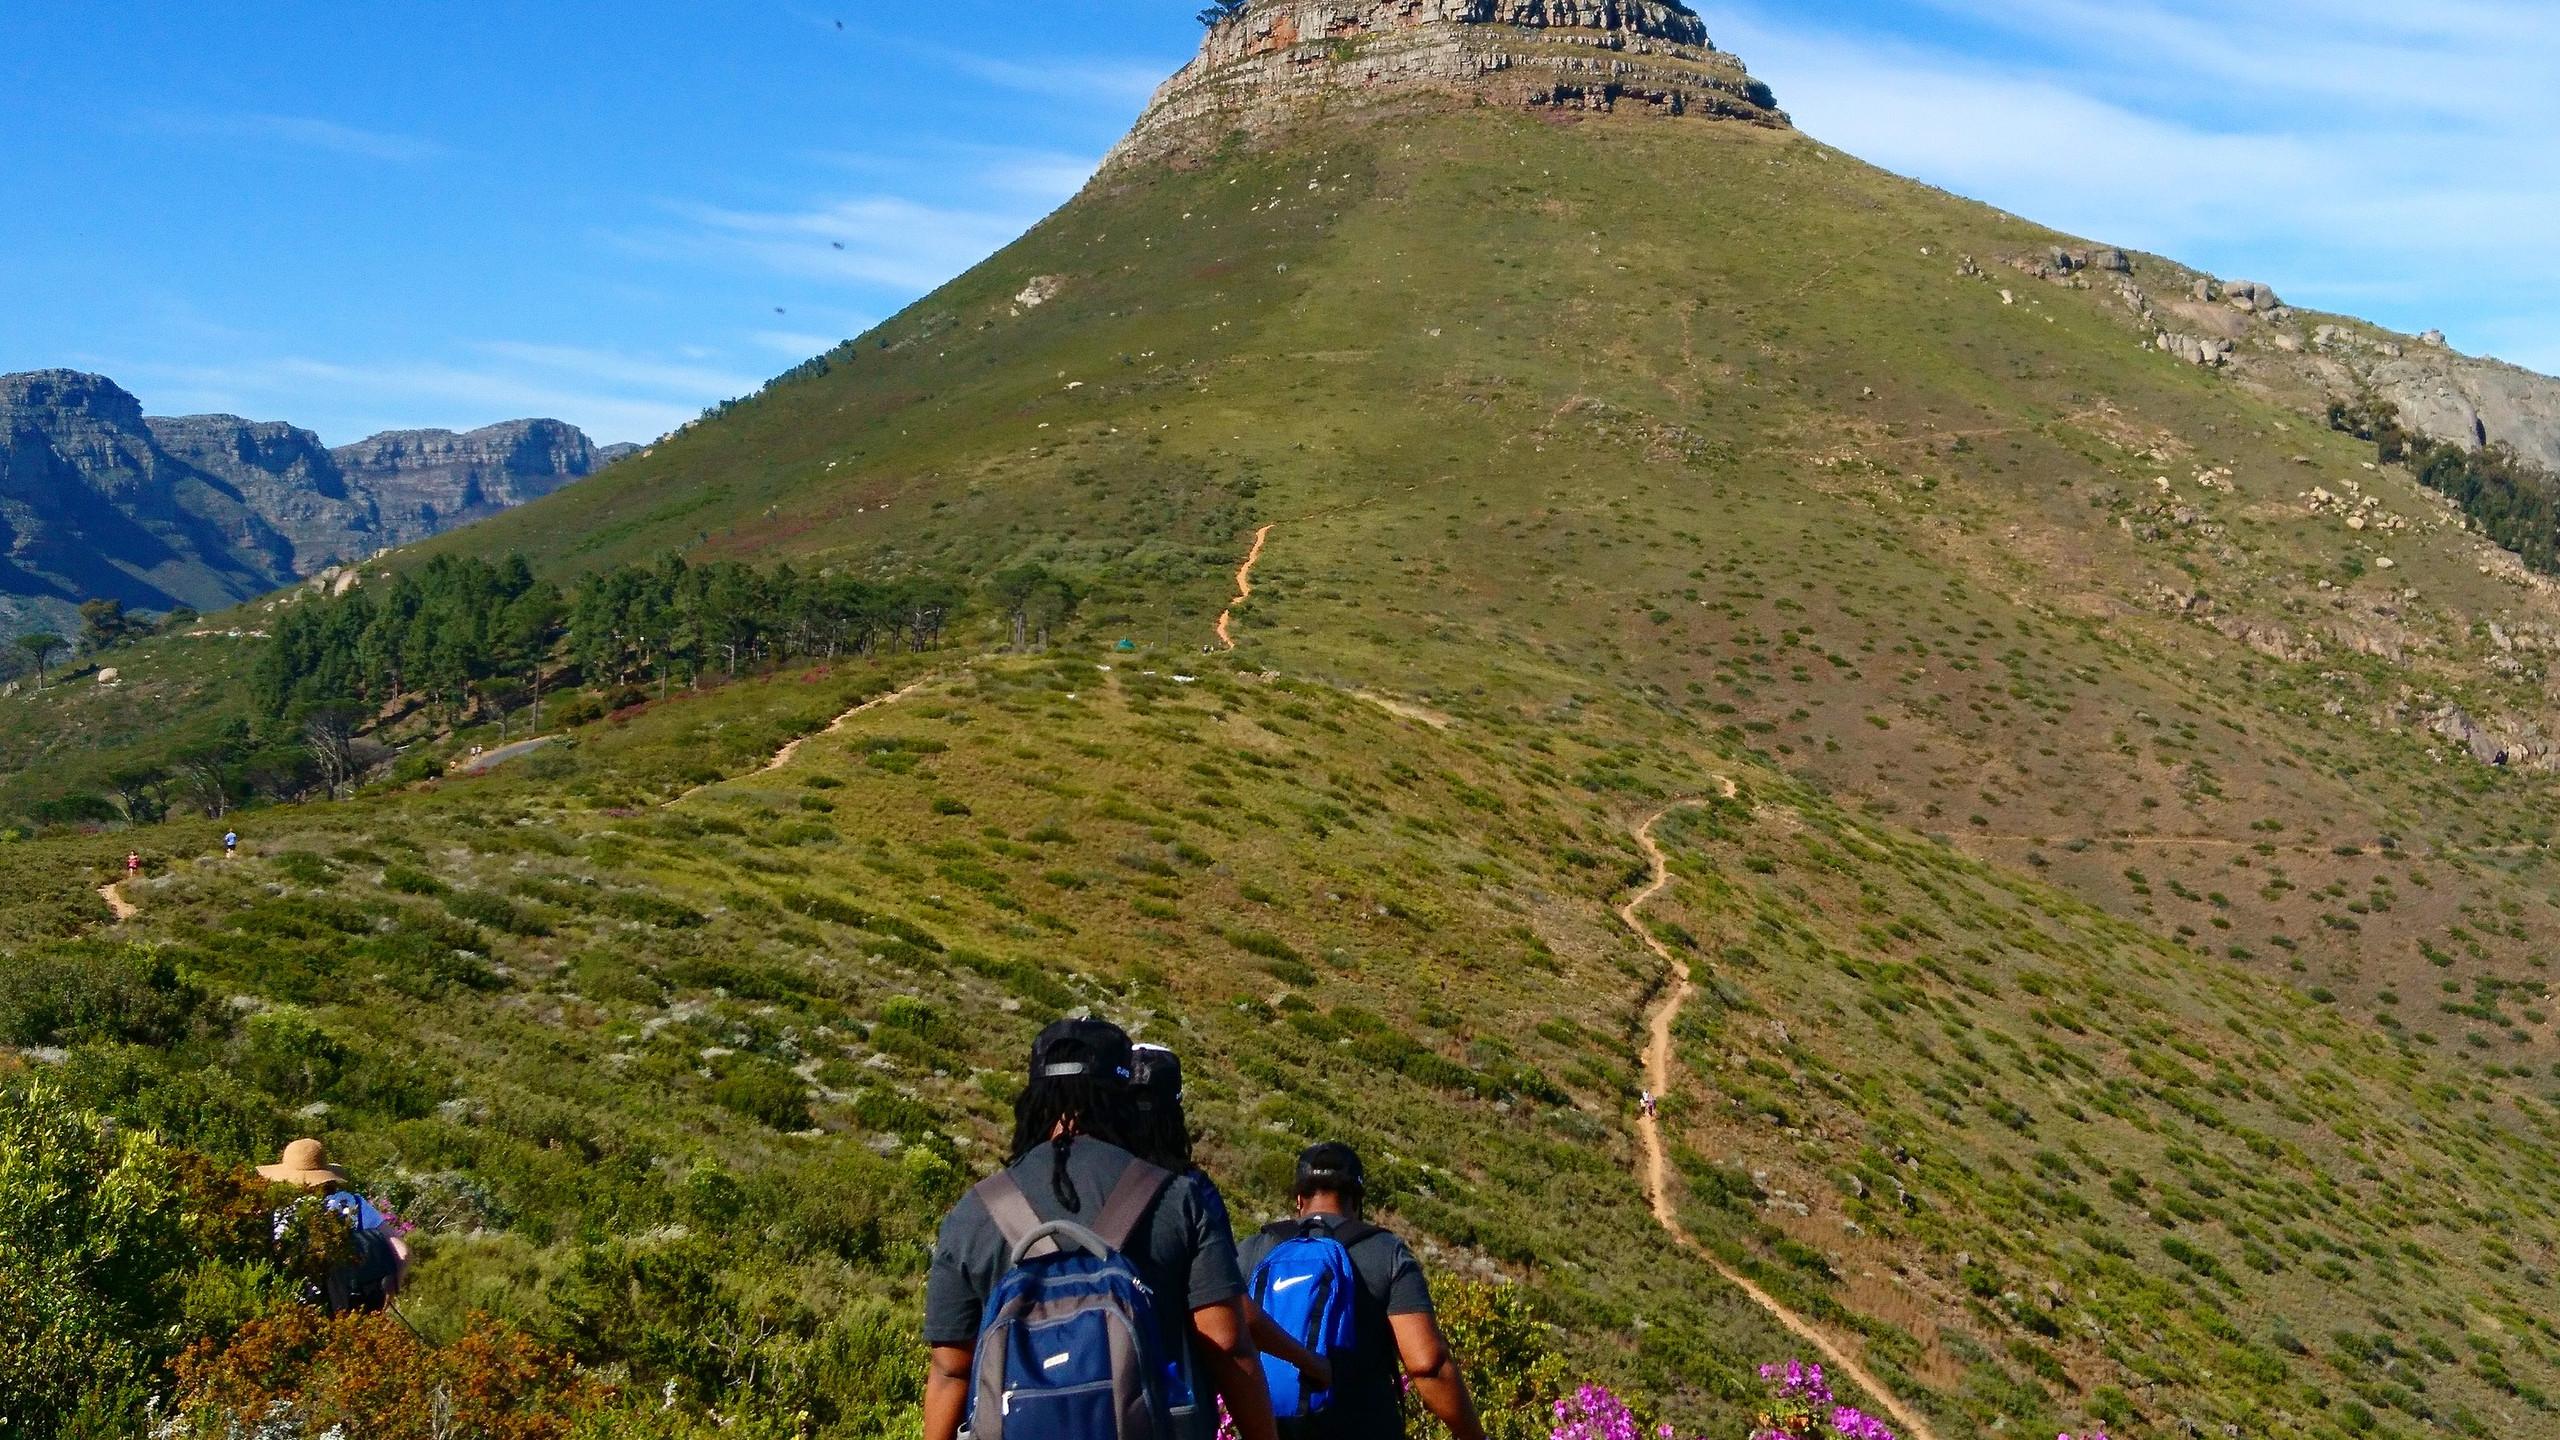 Singnal hill hiking